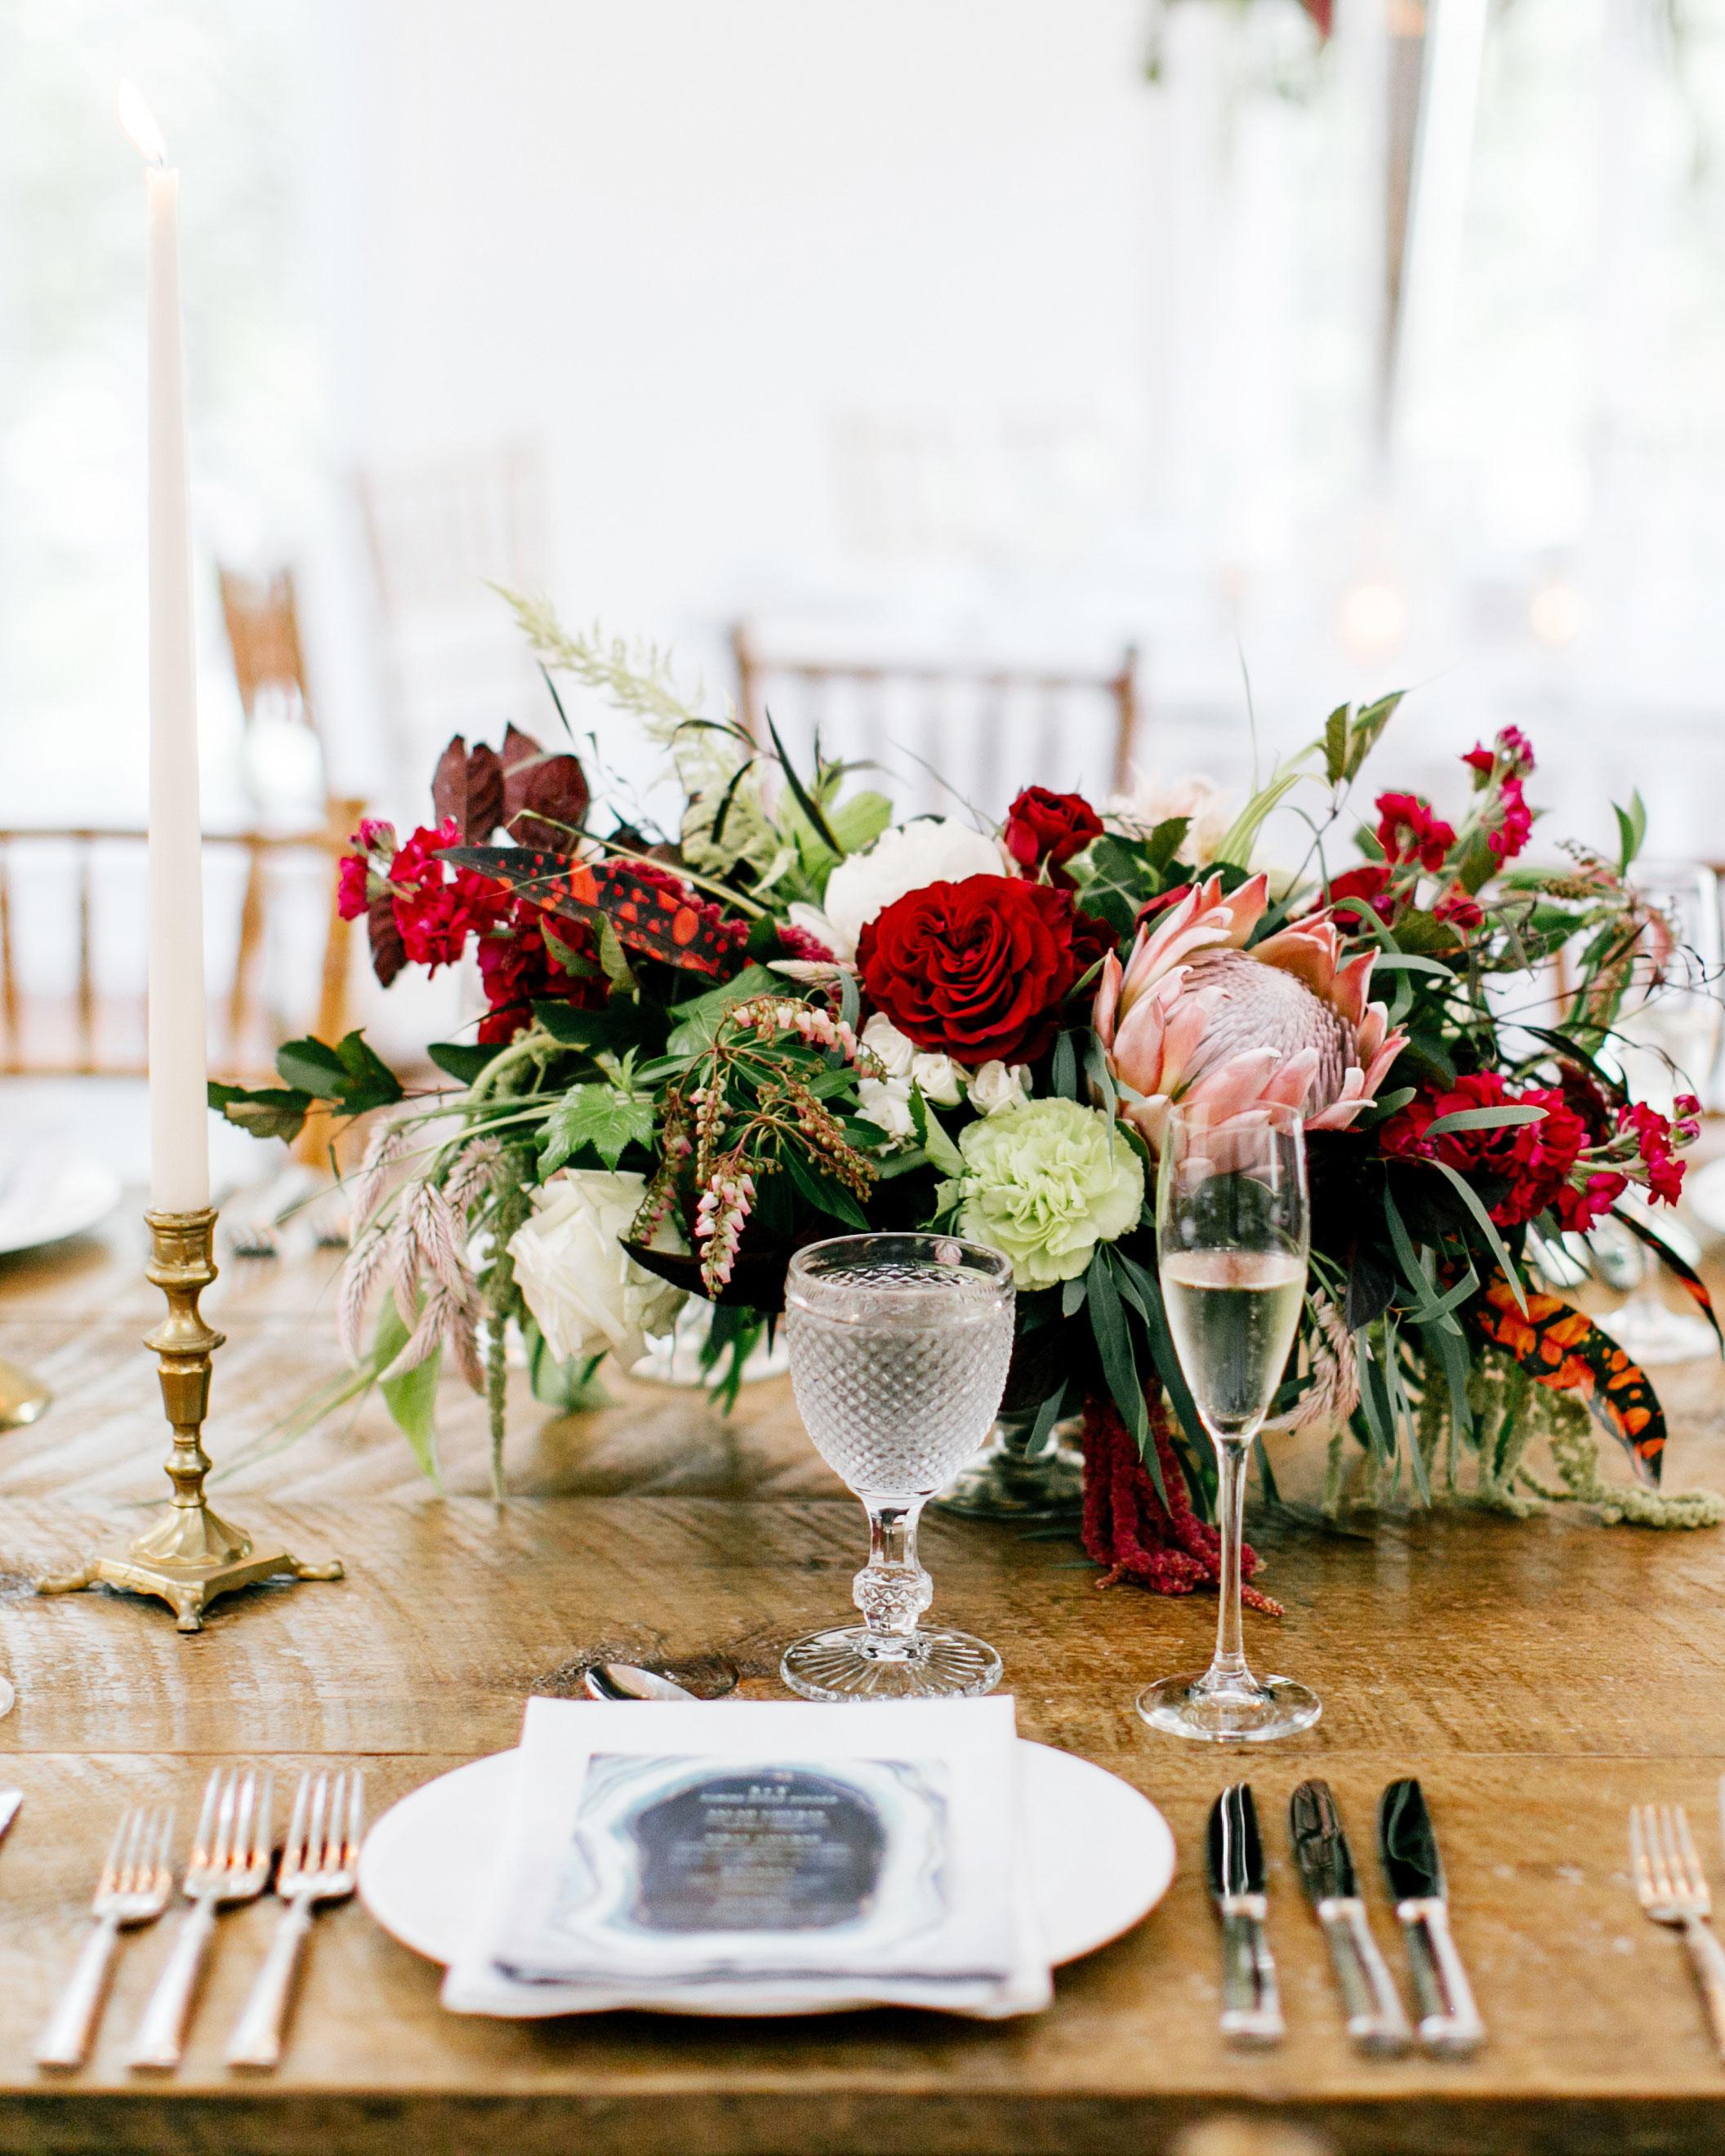 susan-tom-wedding-table-227-s112692-0316.jpg